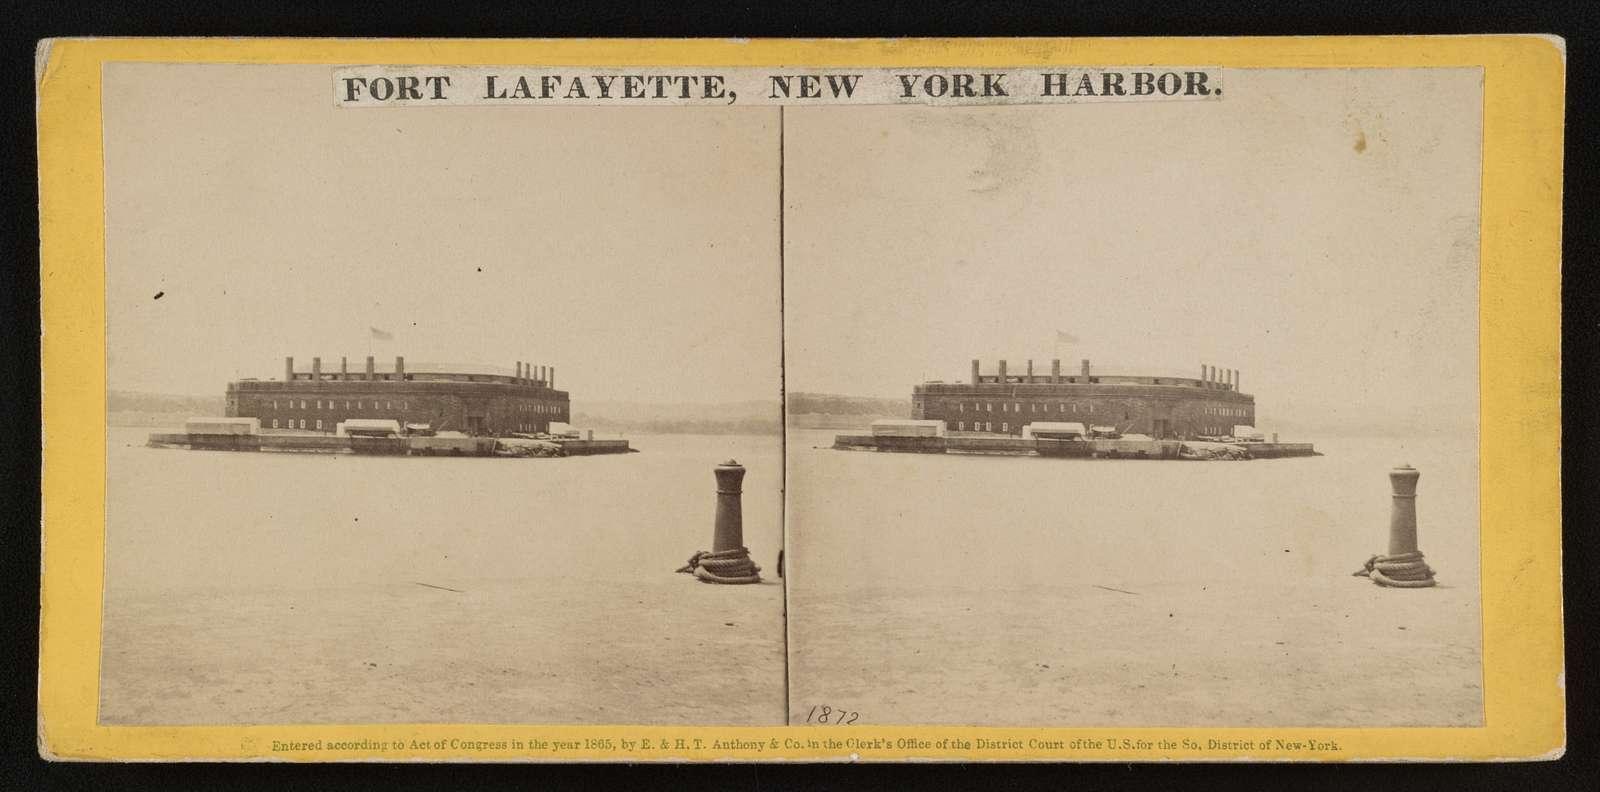 Fort Lafayette, New York Harbor